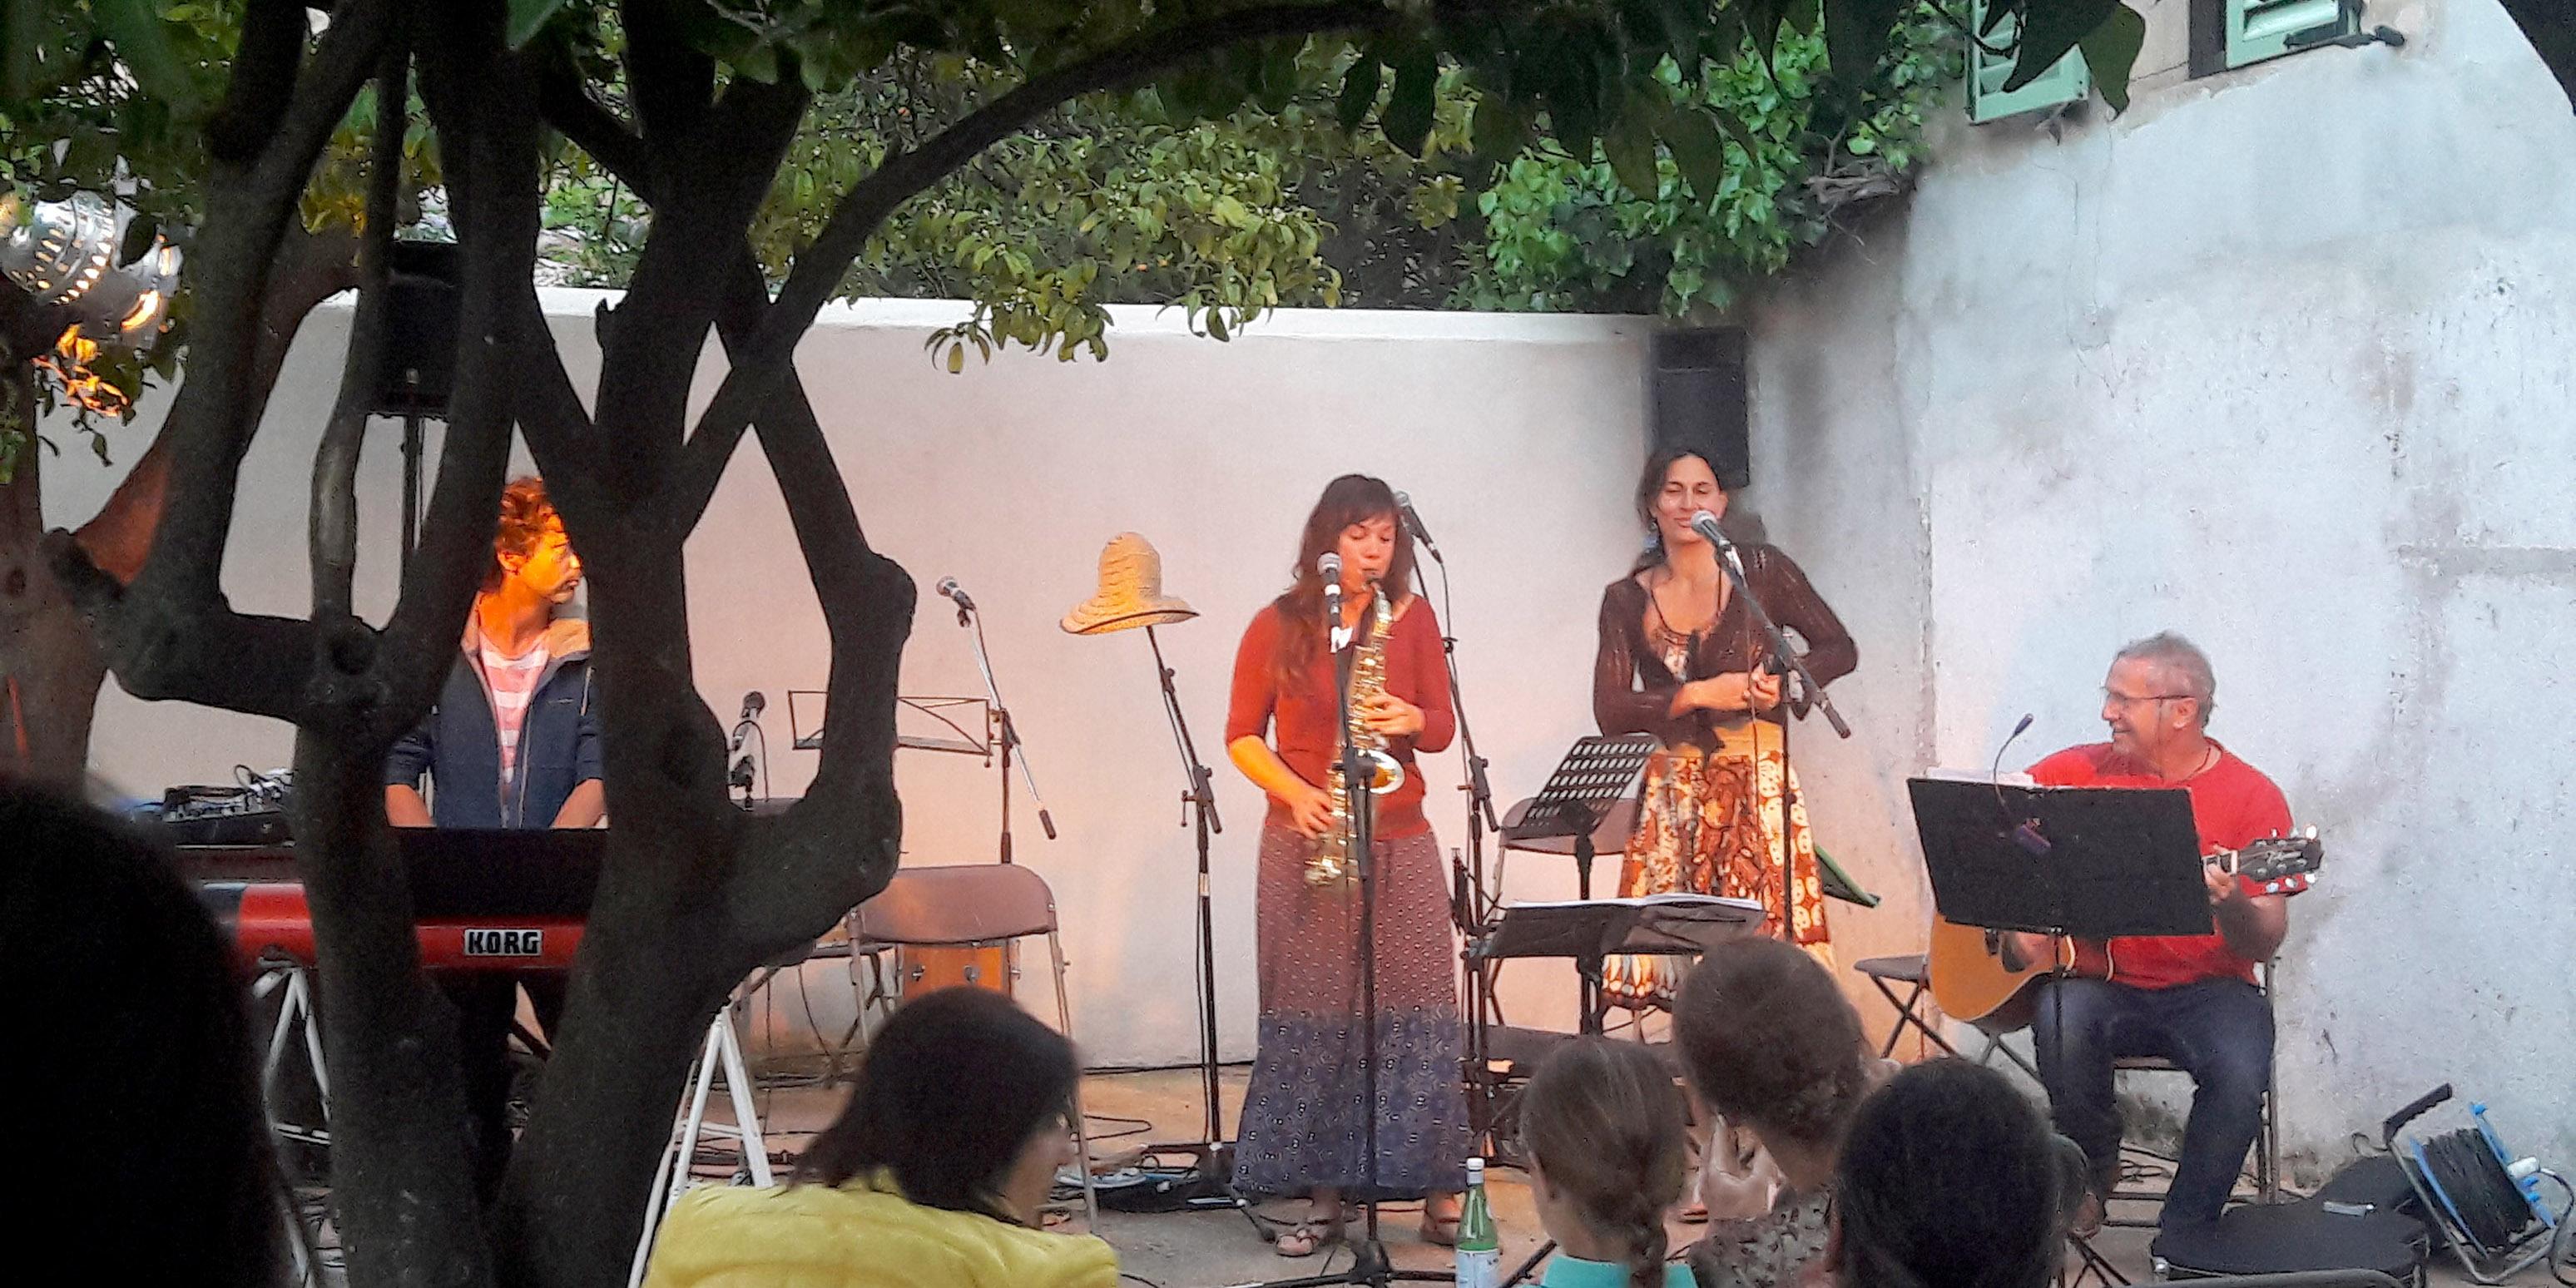 Calenzana : Concert de solidarité au profit de SOS Méditerranée